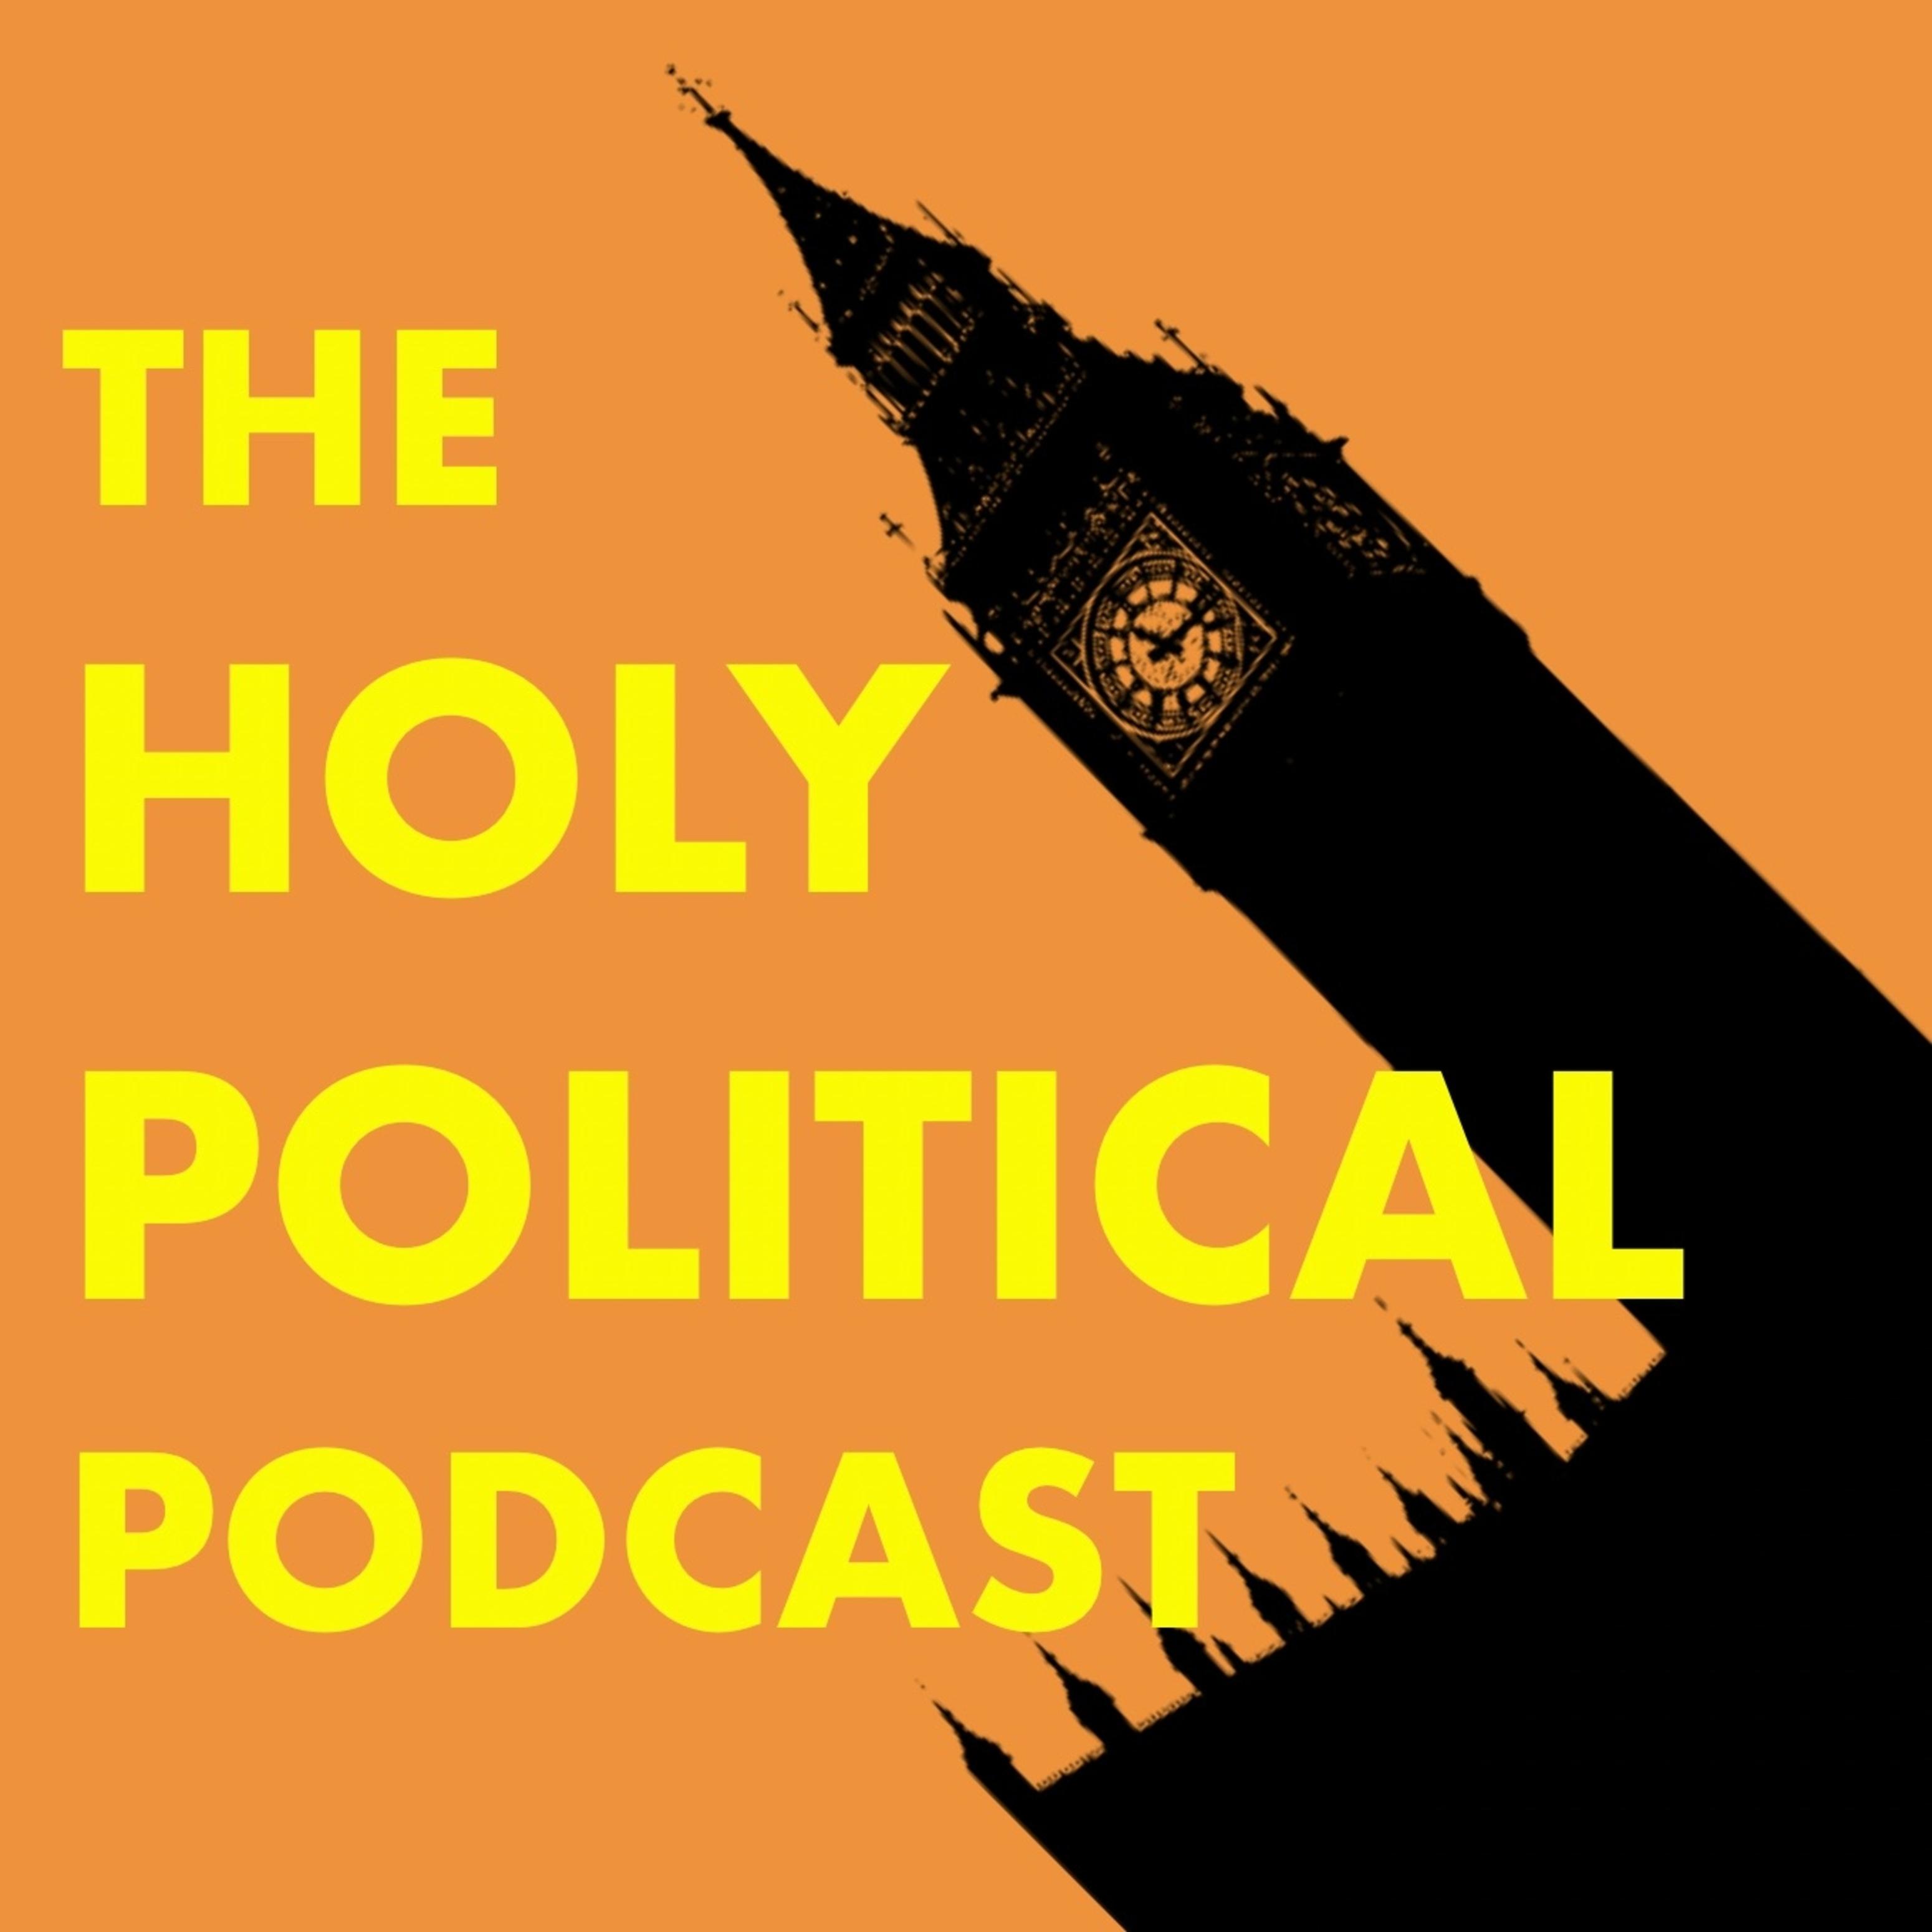 The Holy Political Podcast logo